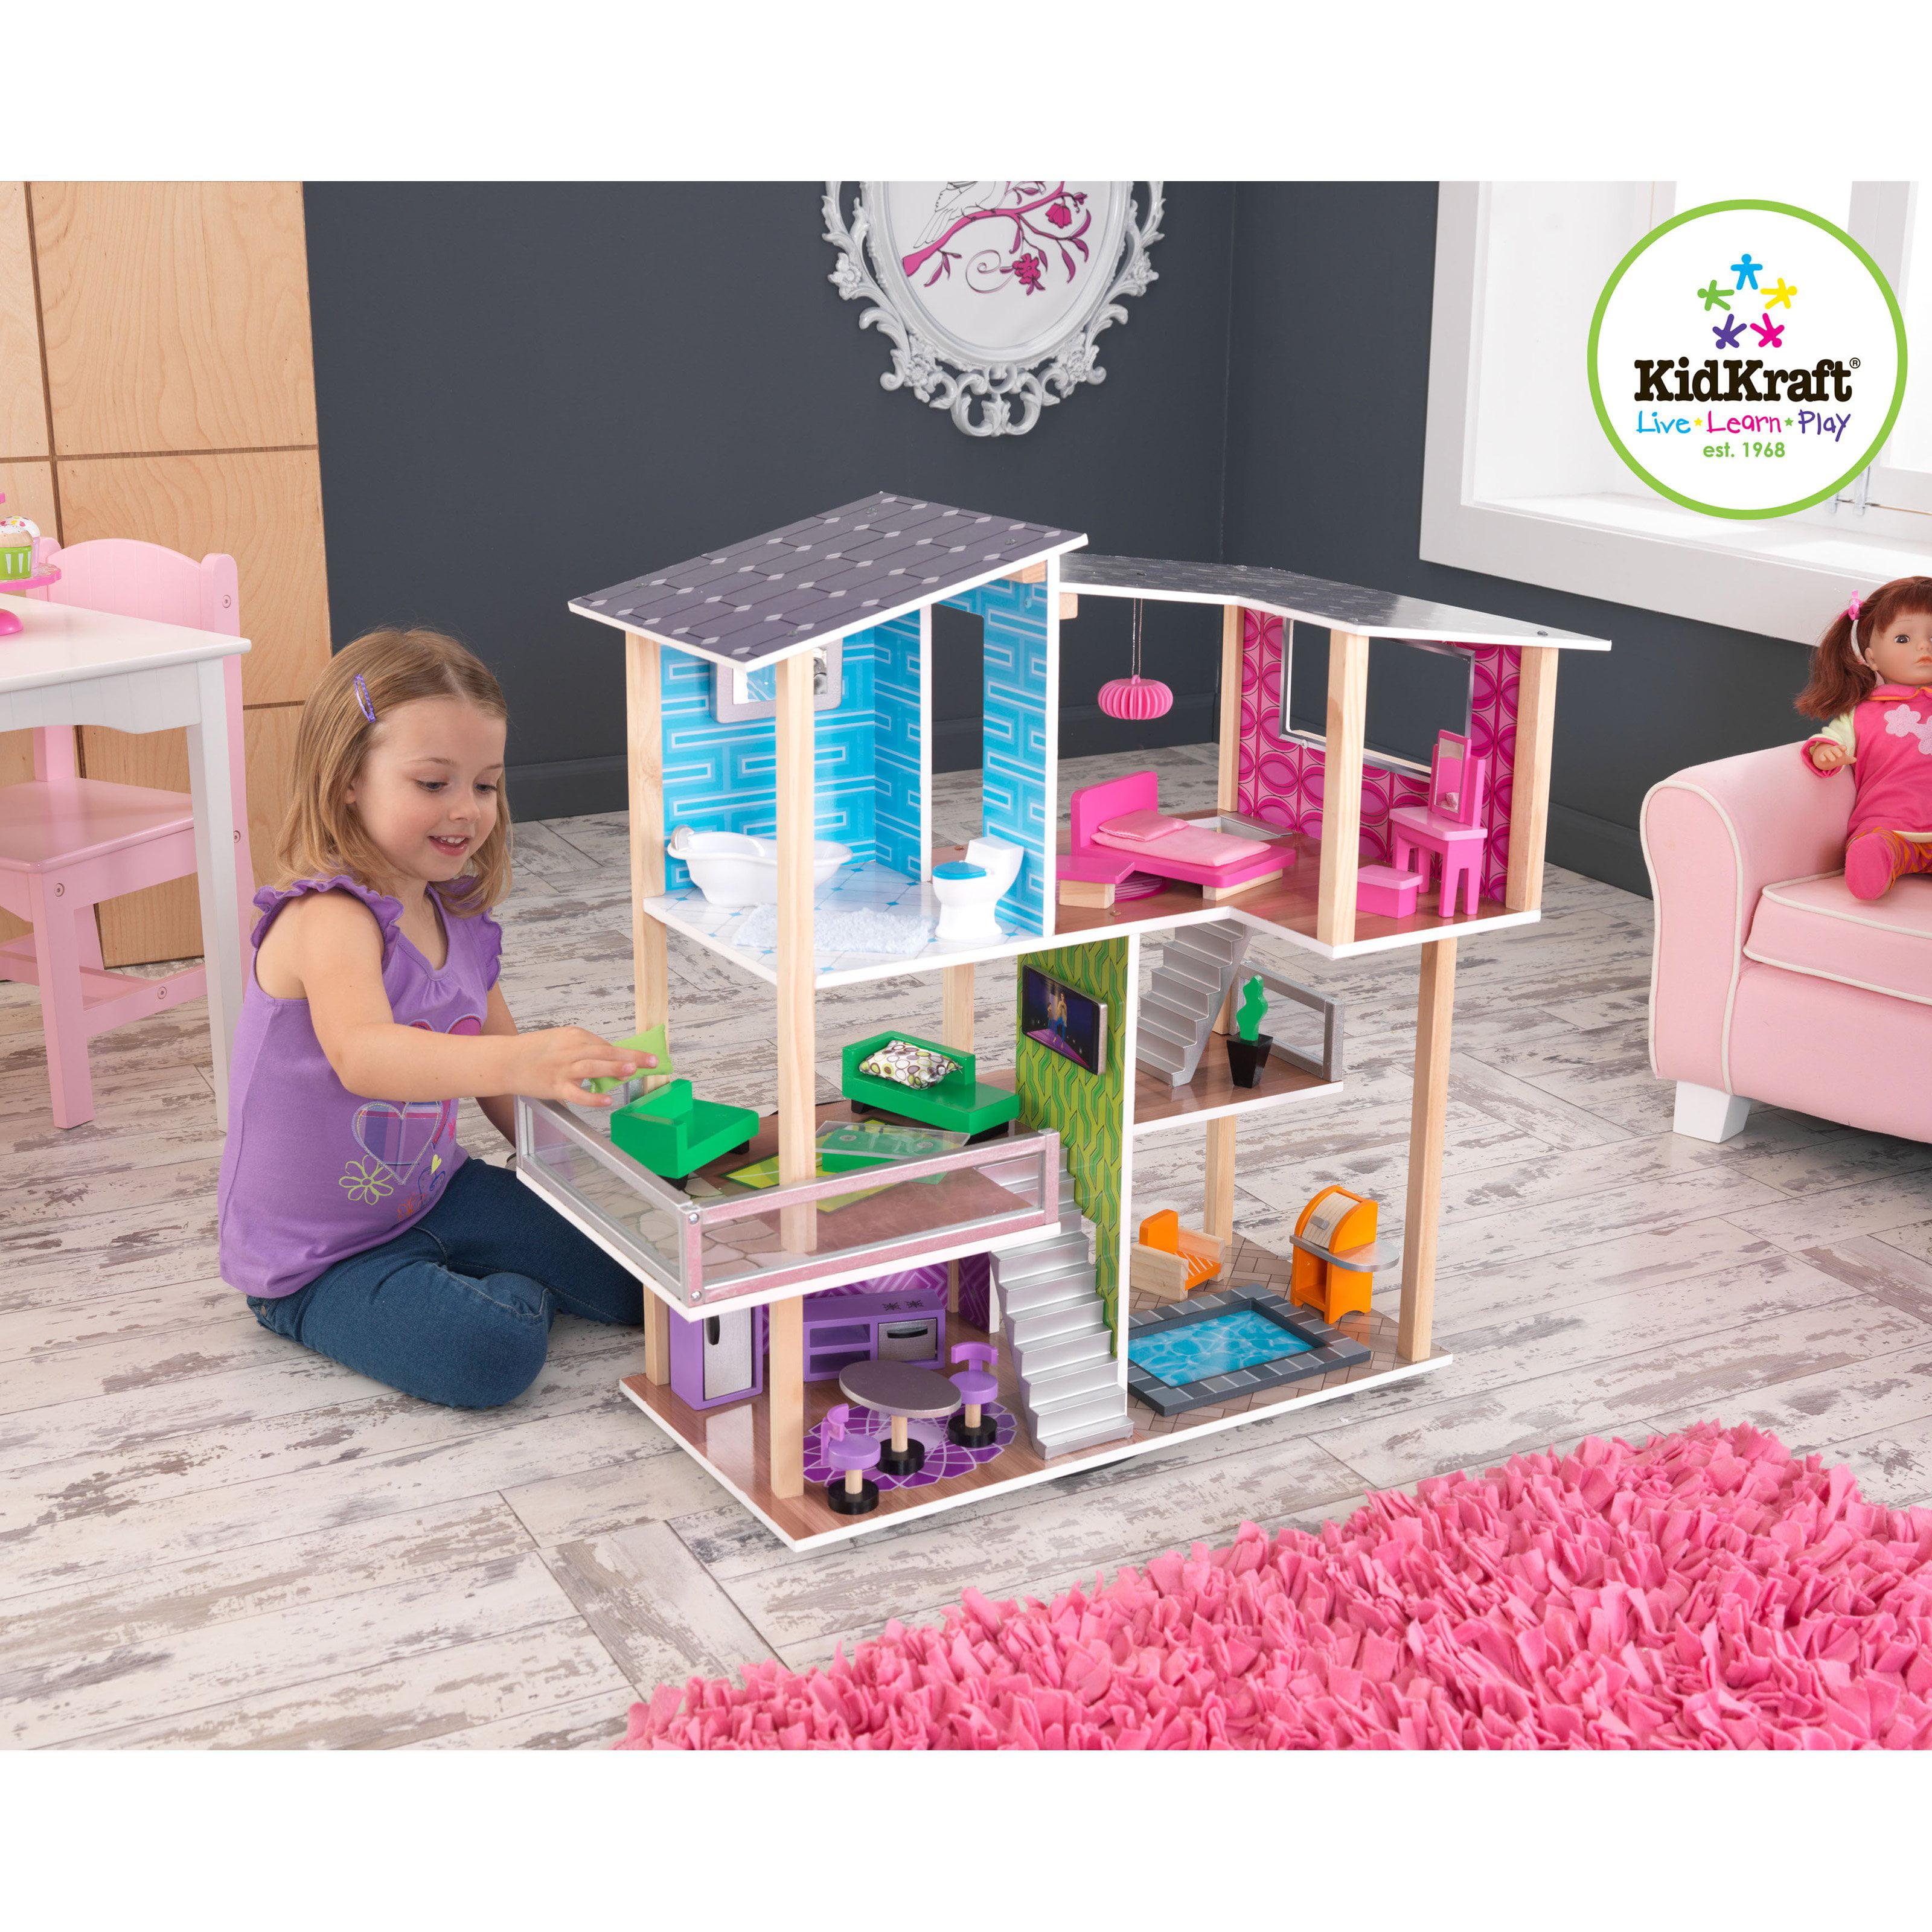 KidKraft Modern Living Dollhouse 65822 Walmartcom